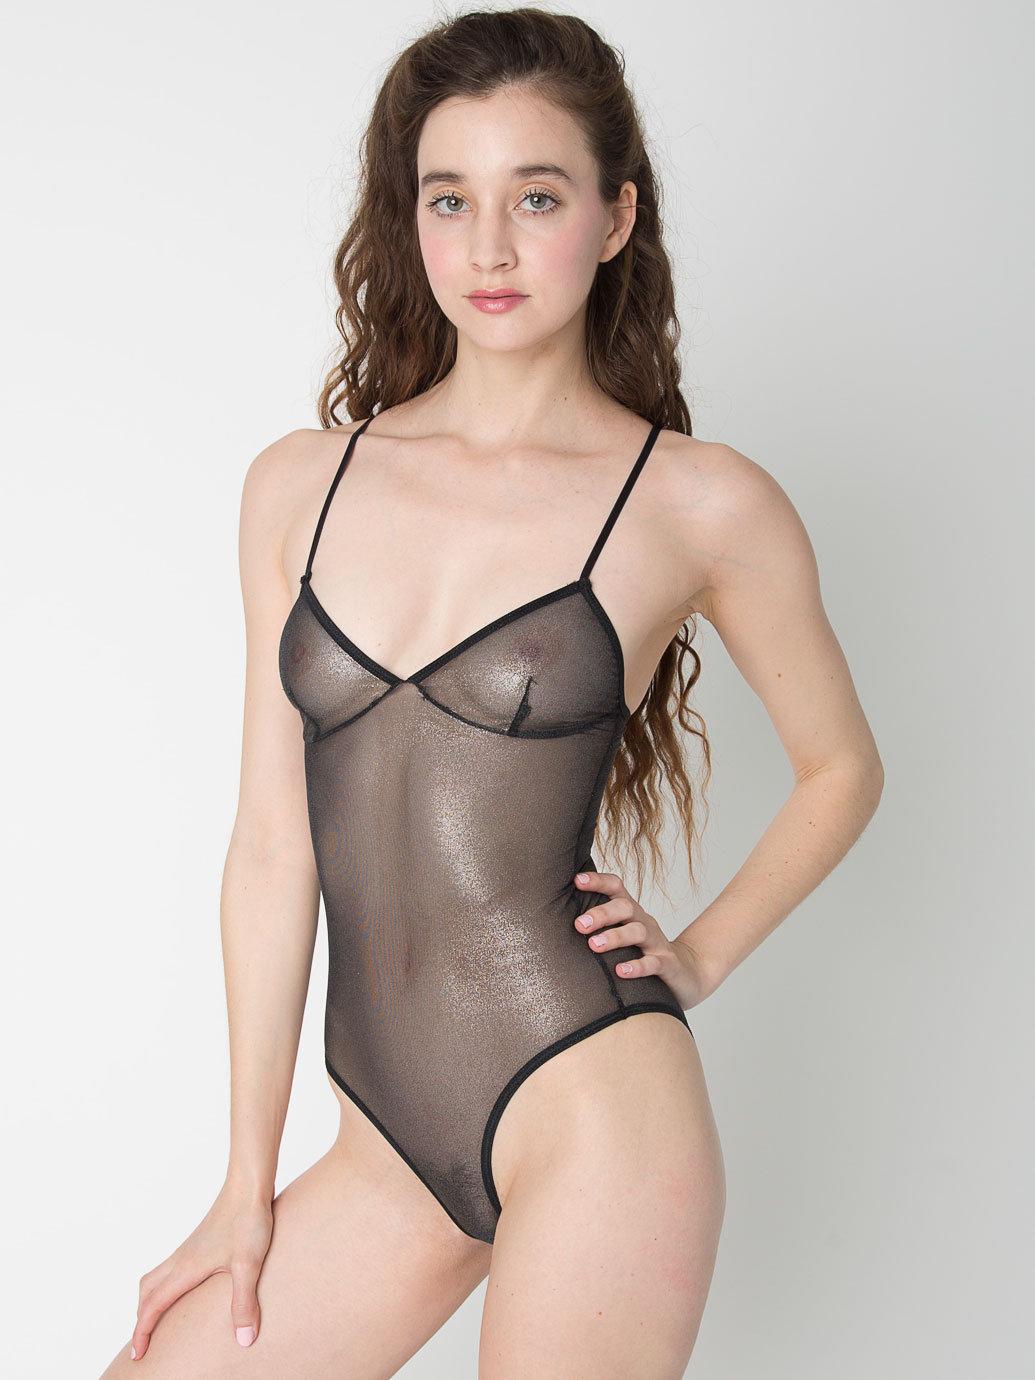 shiny mesh bra bodysuit american apparel